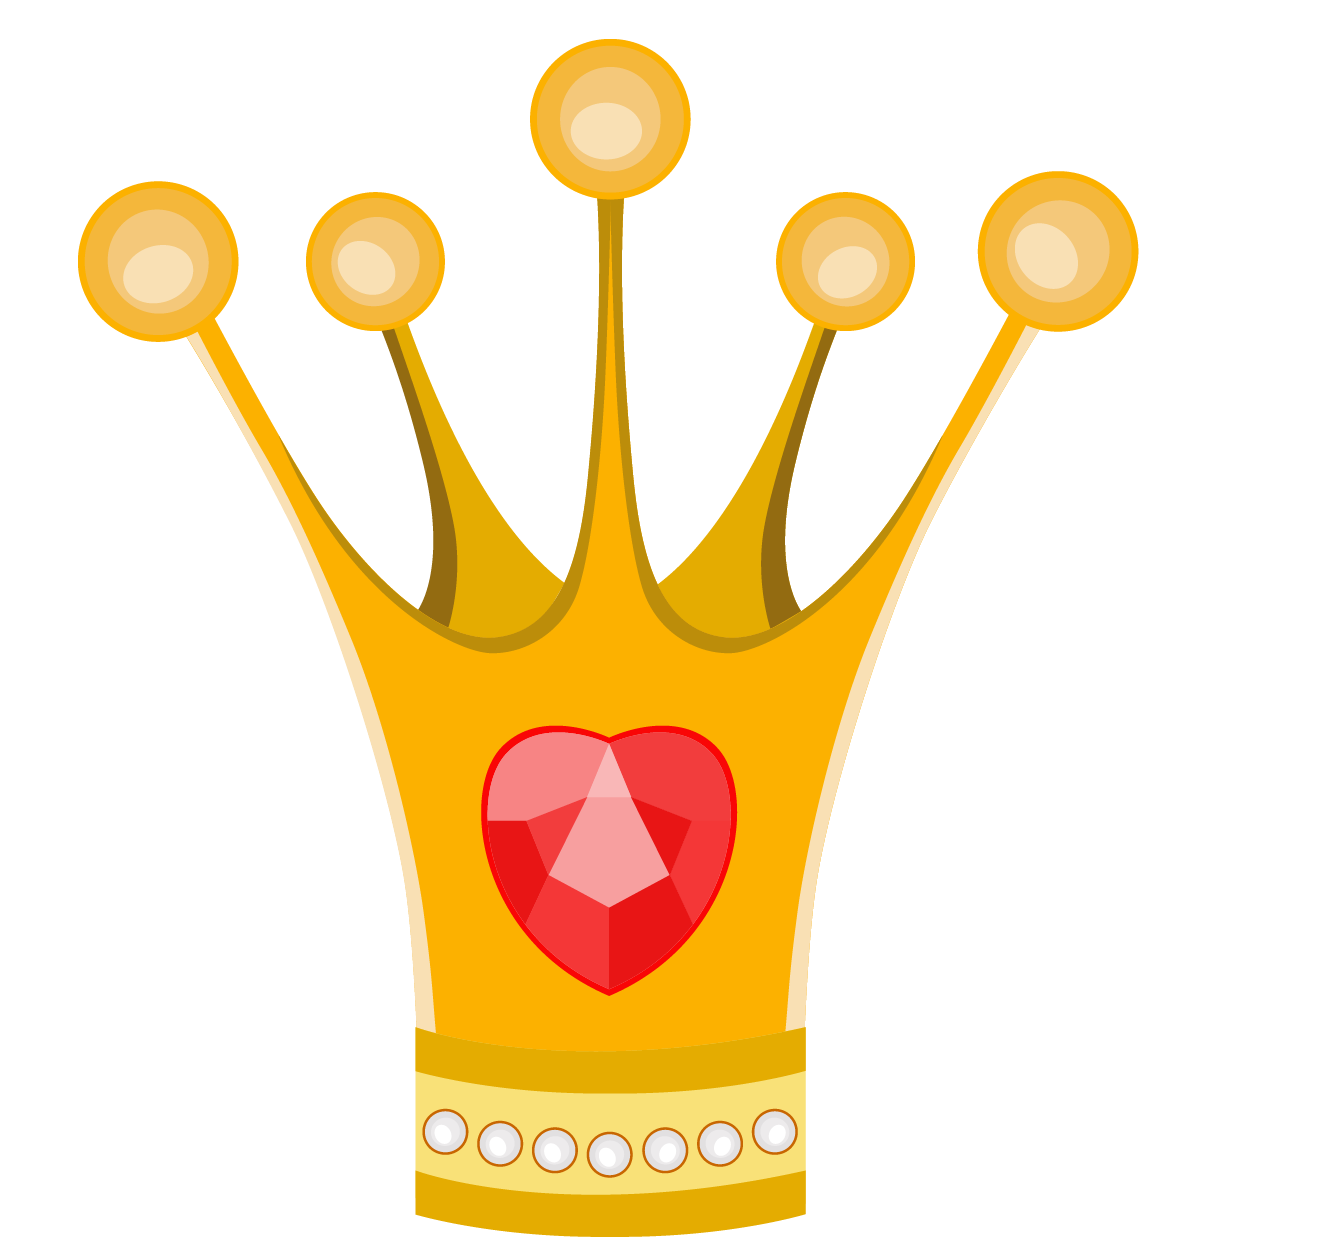 Cartoon material transprent free. Princess crown vector png